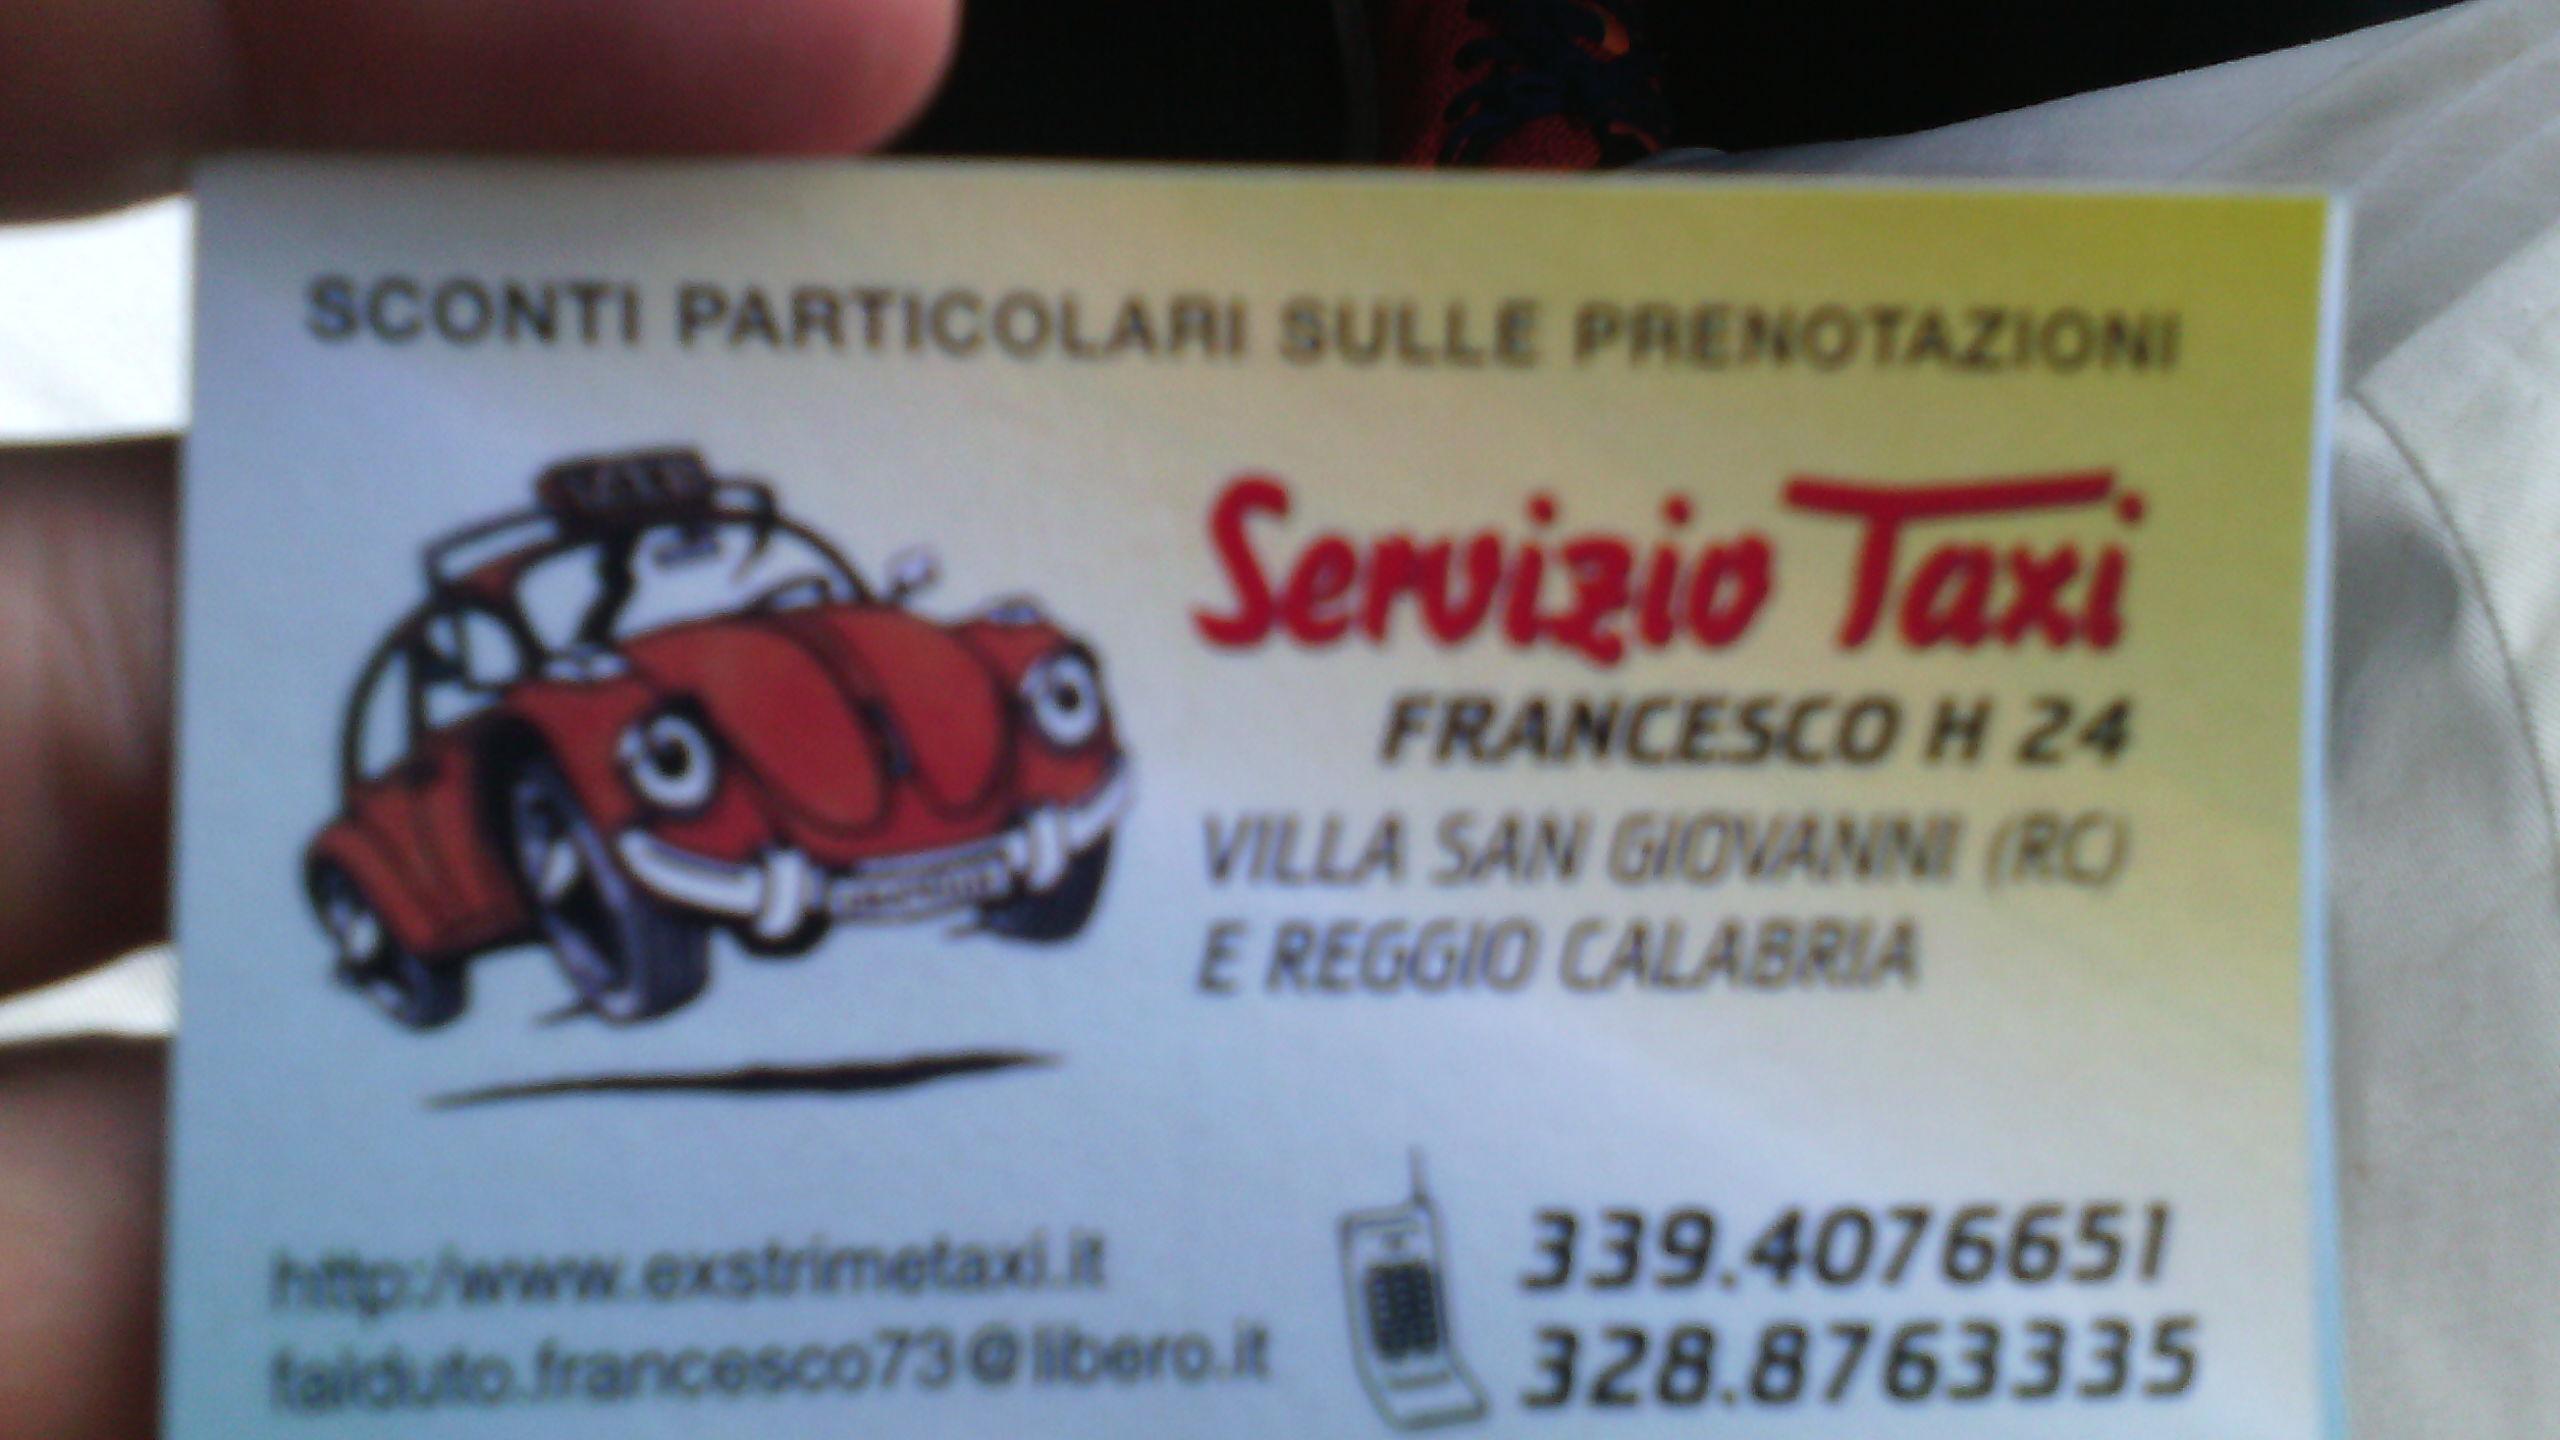 Exstrime di Falduto Francesco